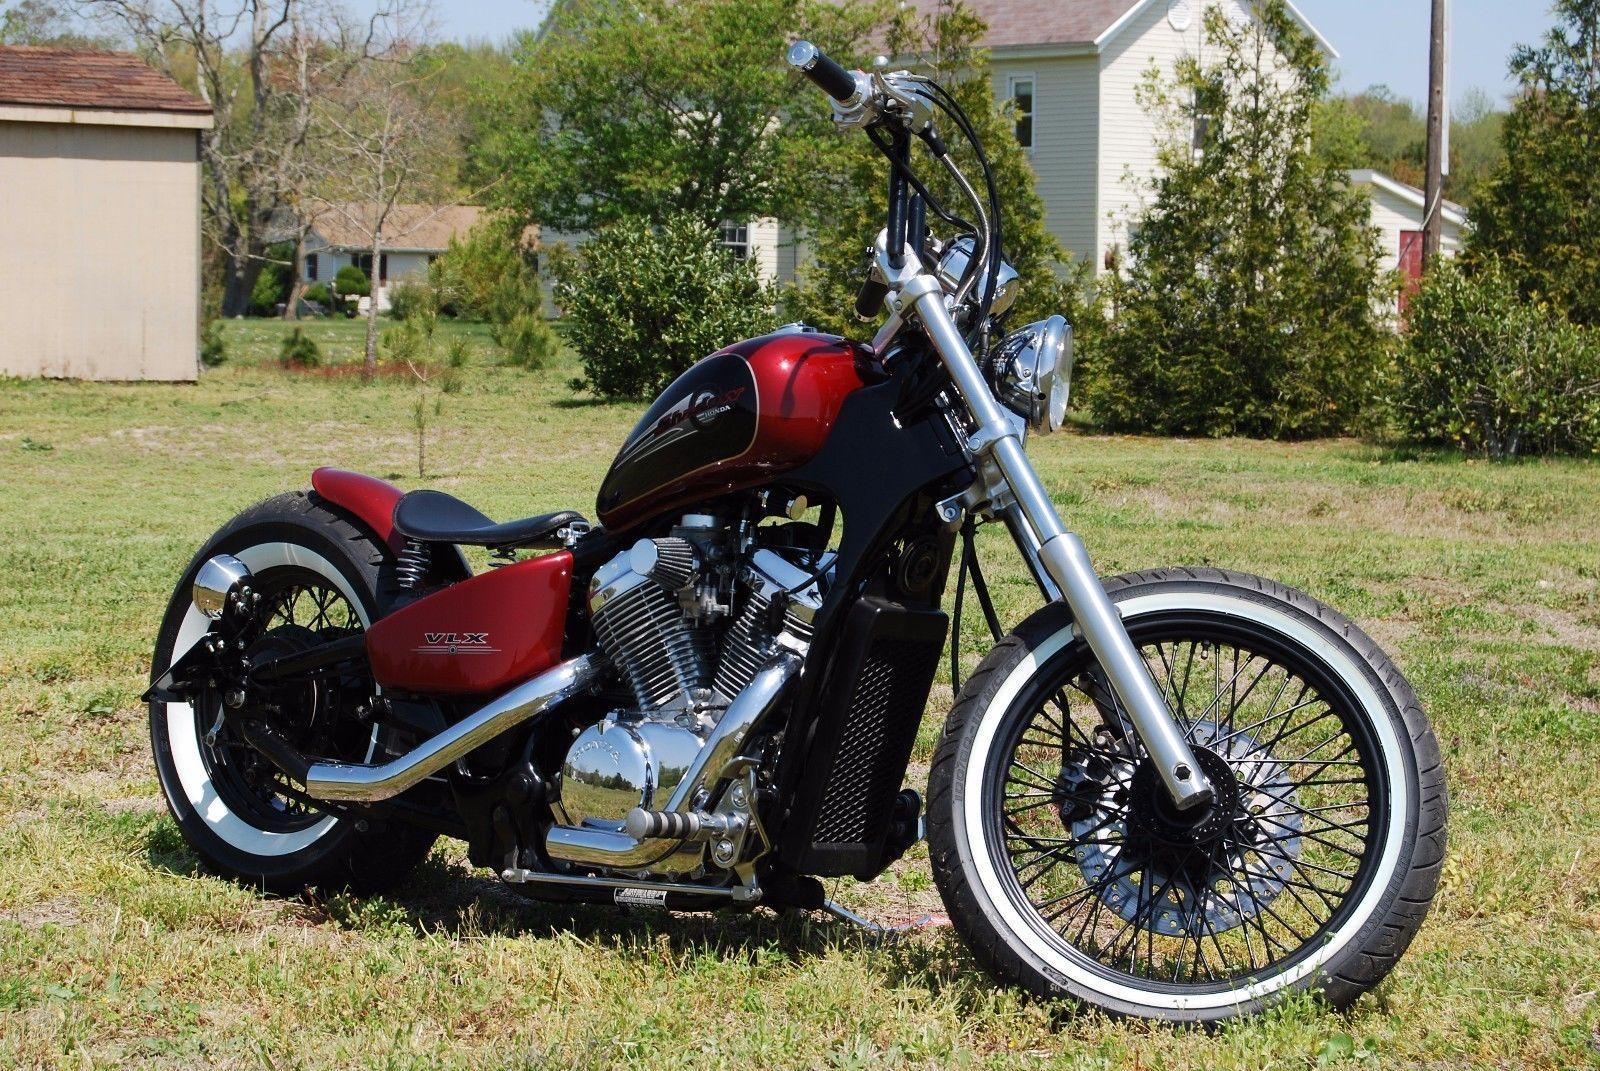 How To Build Custom Bobber Motorcycle Dvd Honda Shadow Vlx 600